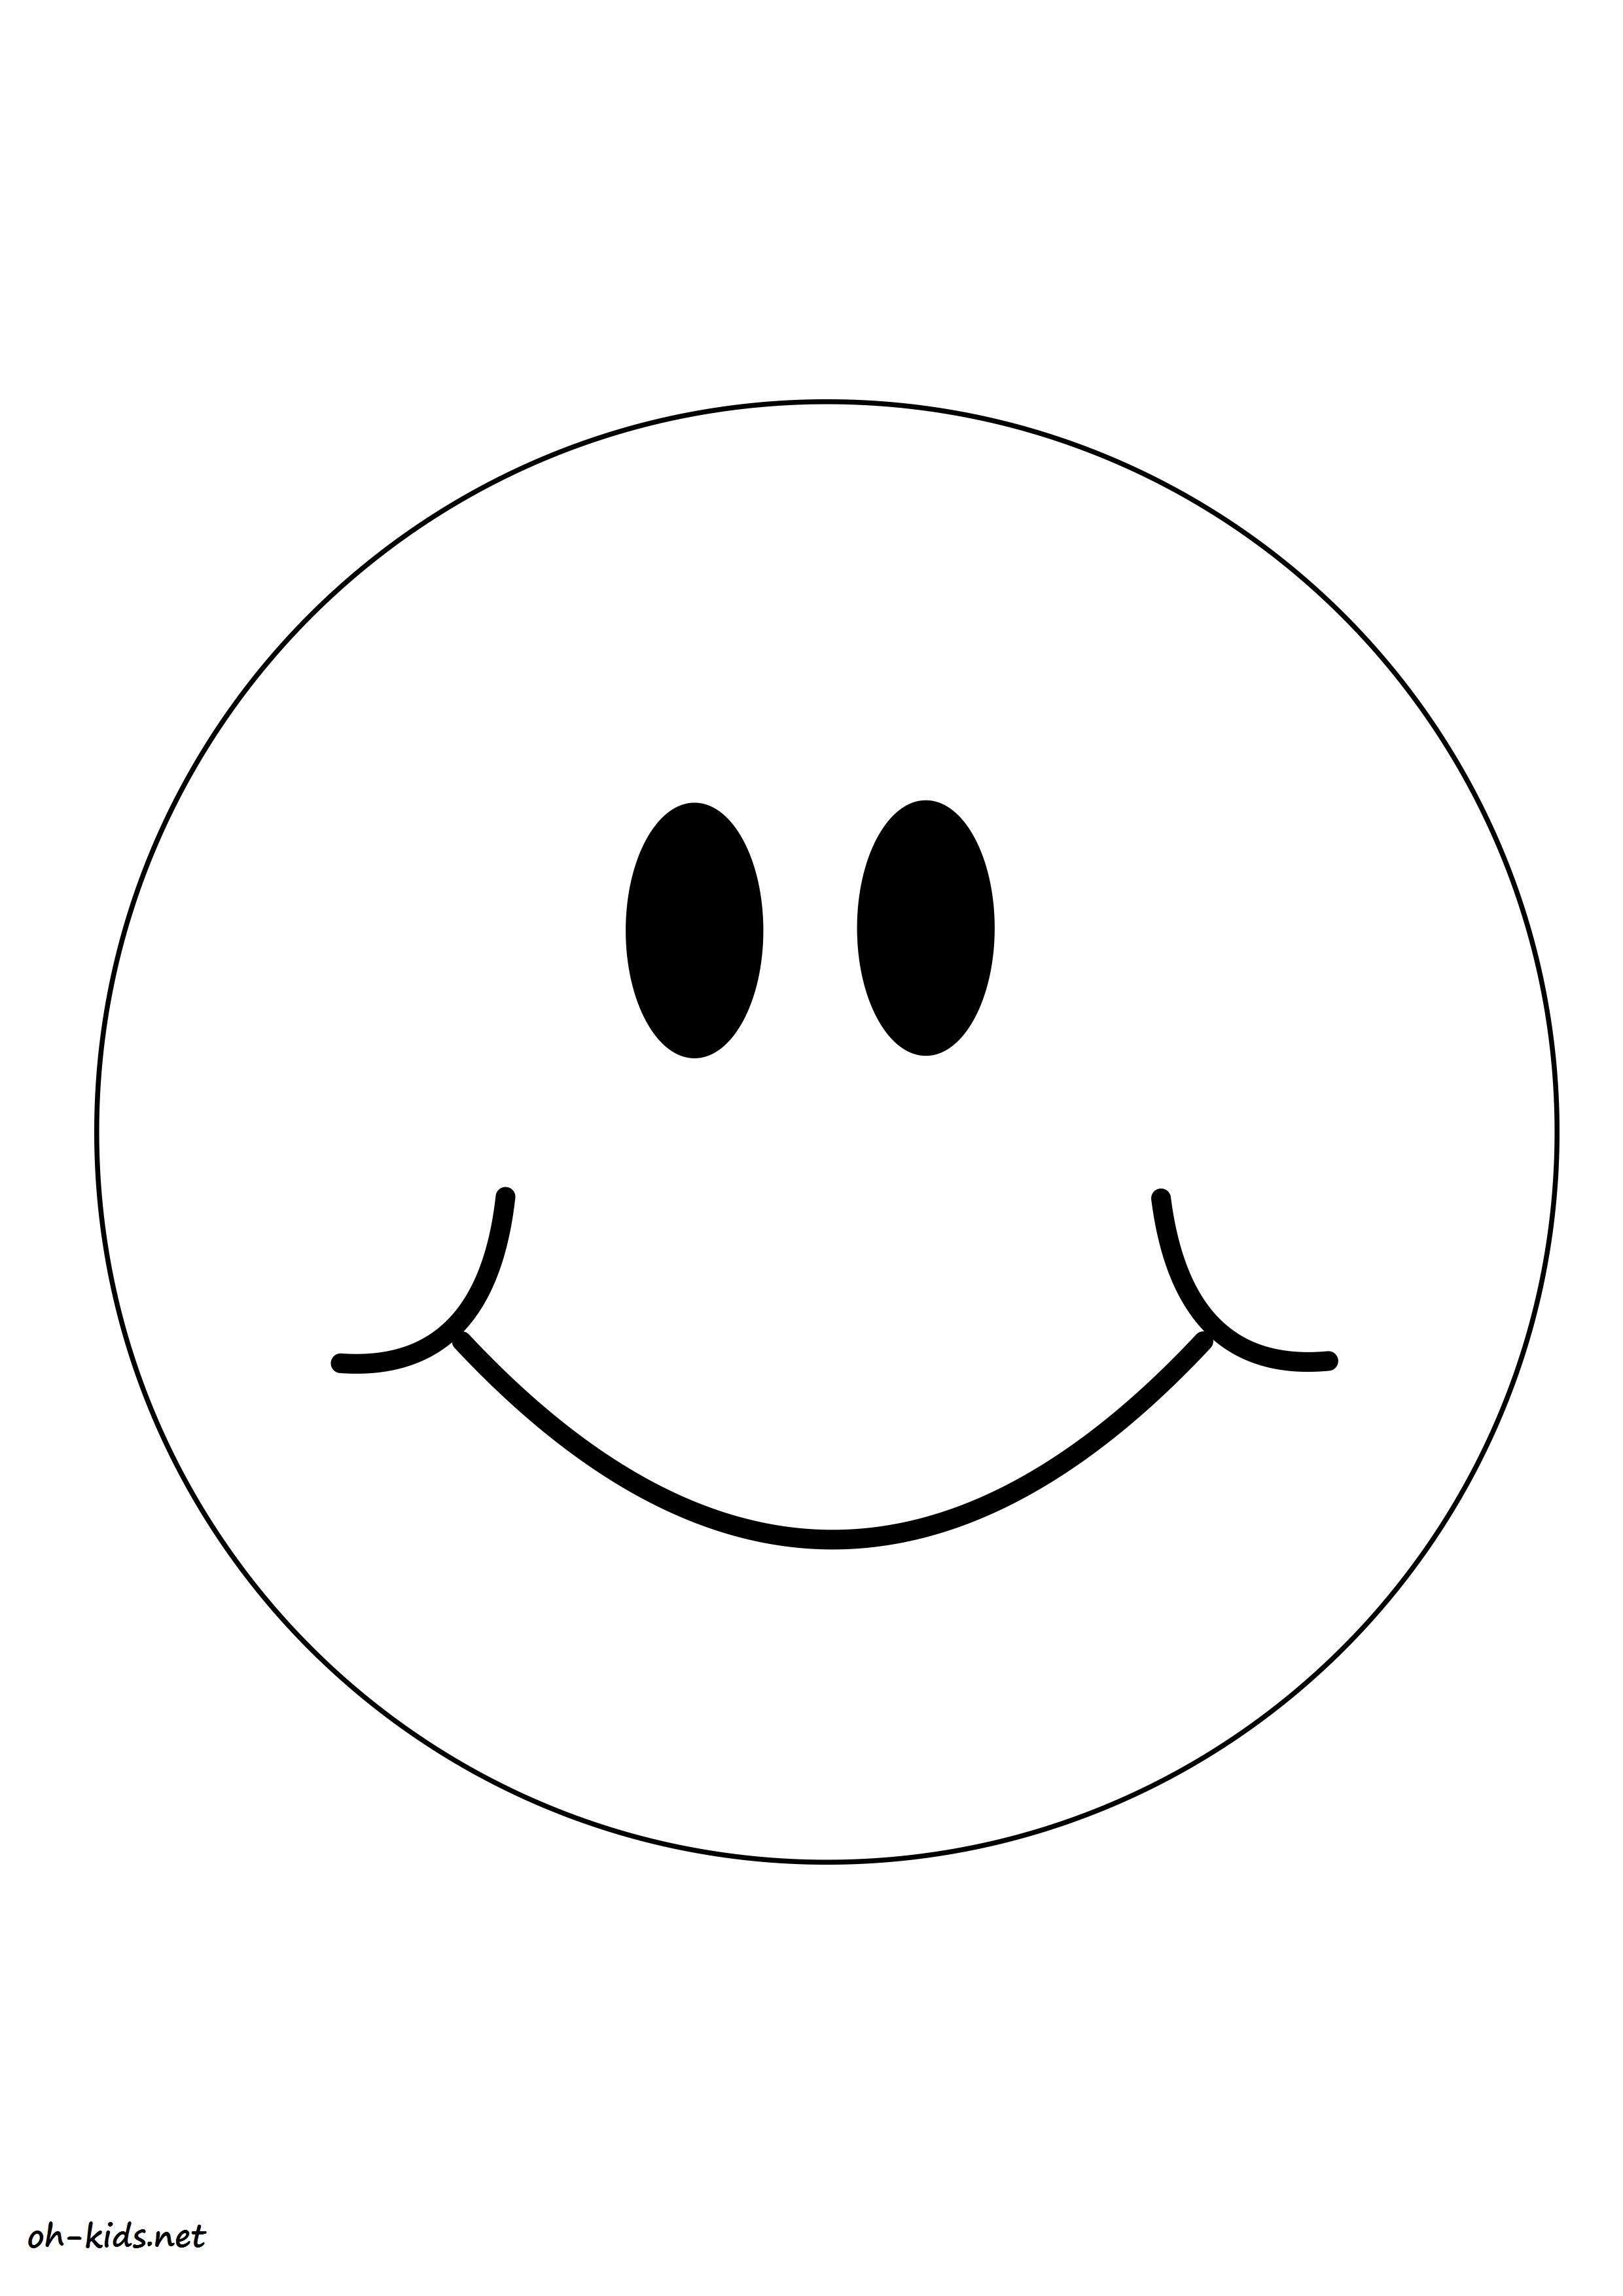 Dessin #754 - Coloriage smiley à imprimer - Oh-Kids.net